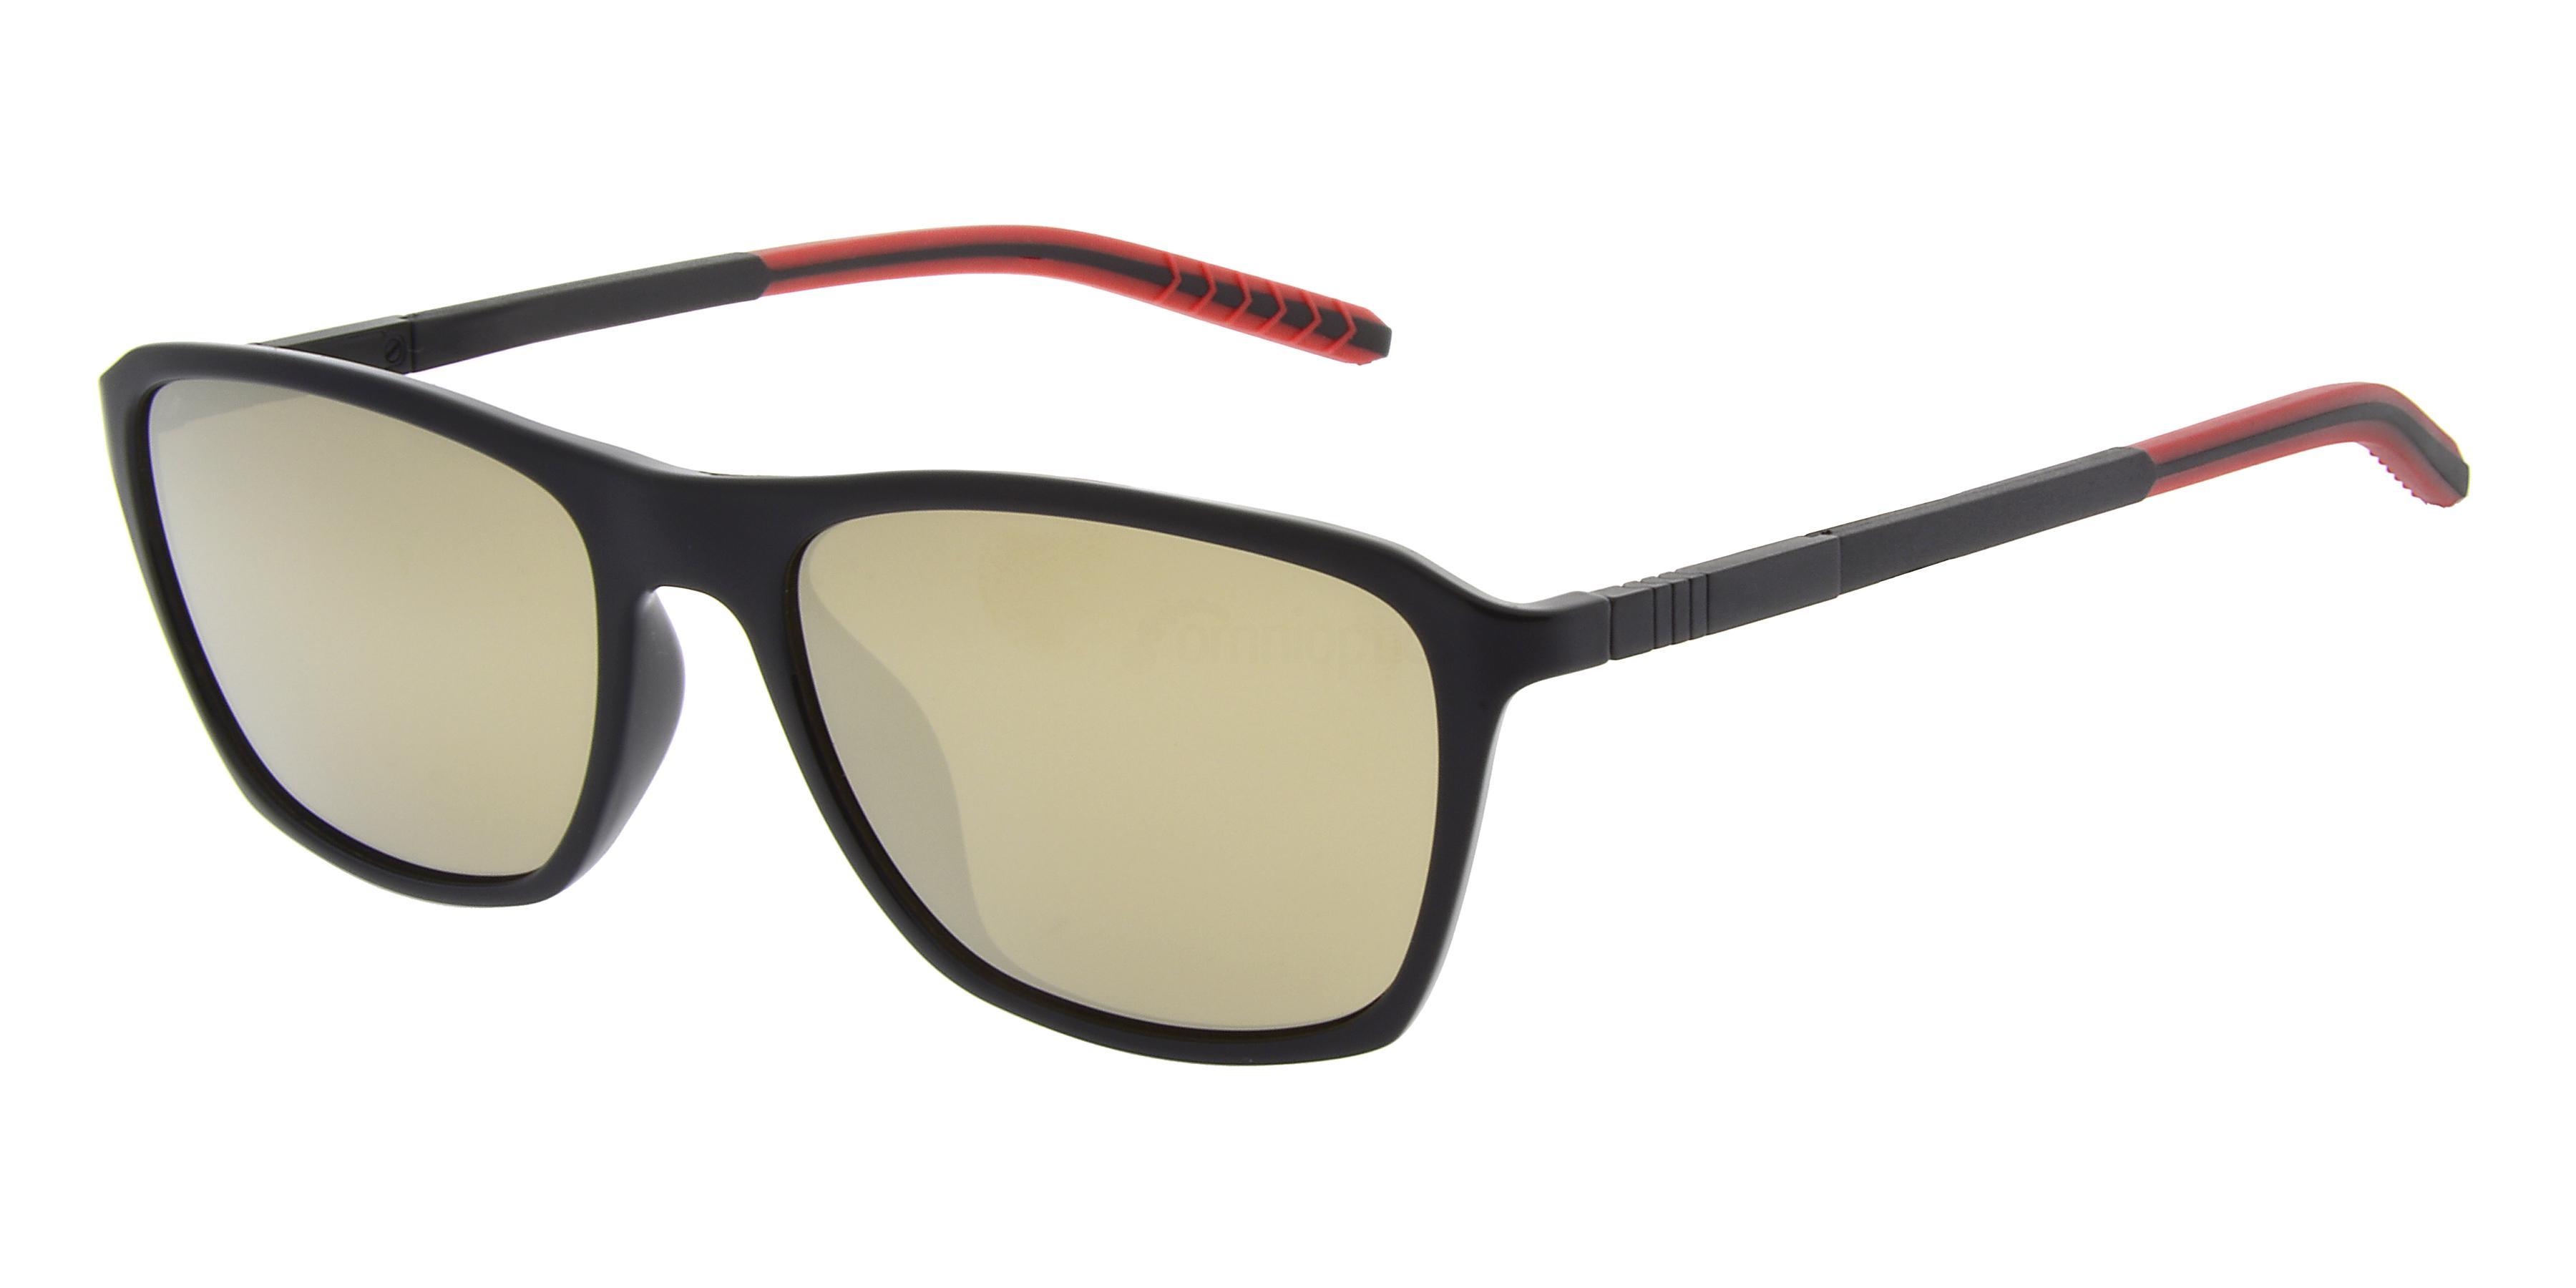 085 SP3402 Sunglasses, Spine